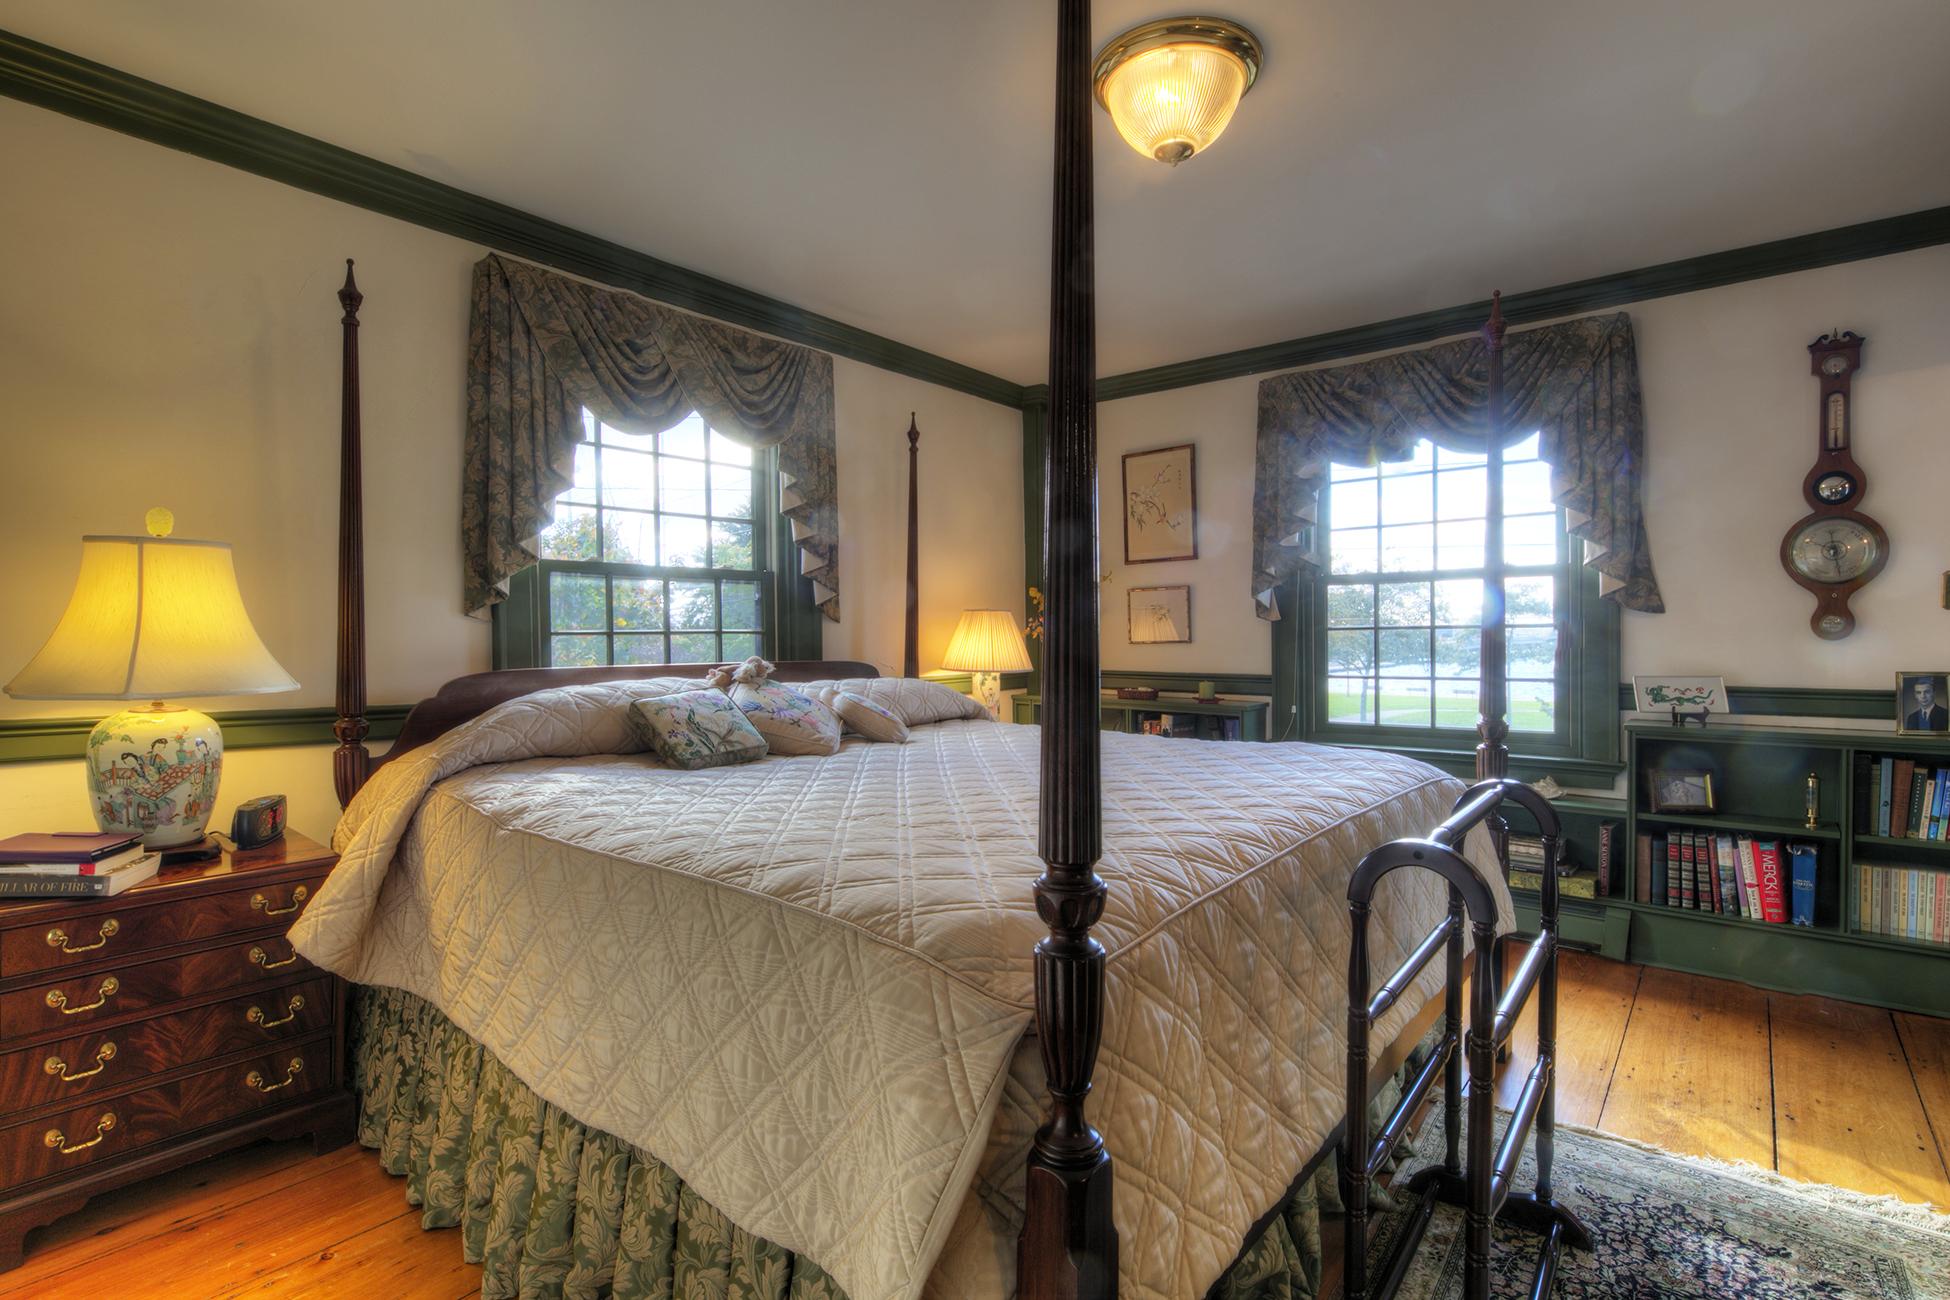 Additional photo for property listing at The John Bigelow House 41 Washington Street Newport, Rhode Island 02840 Estados Unidos